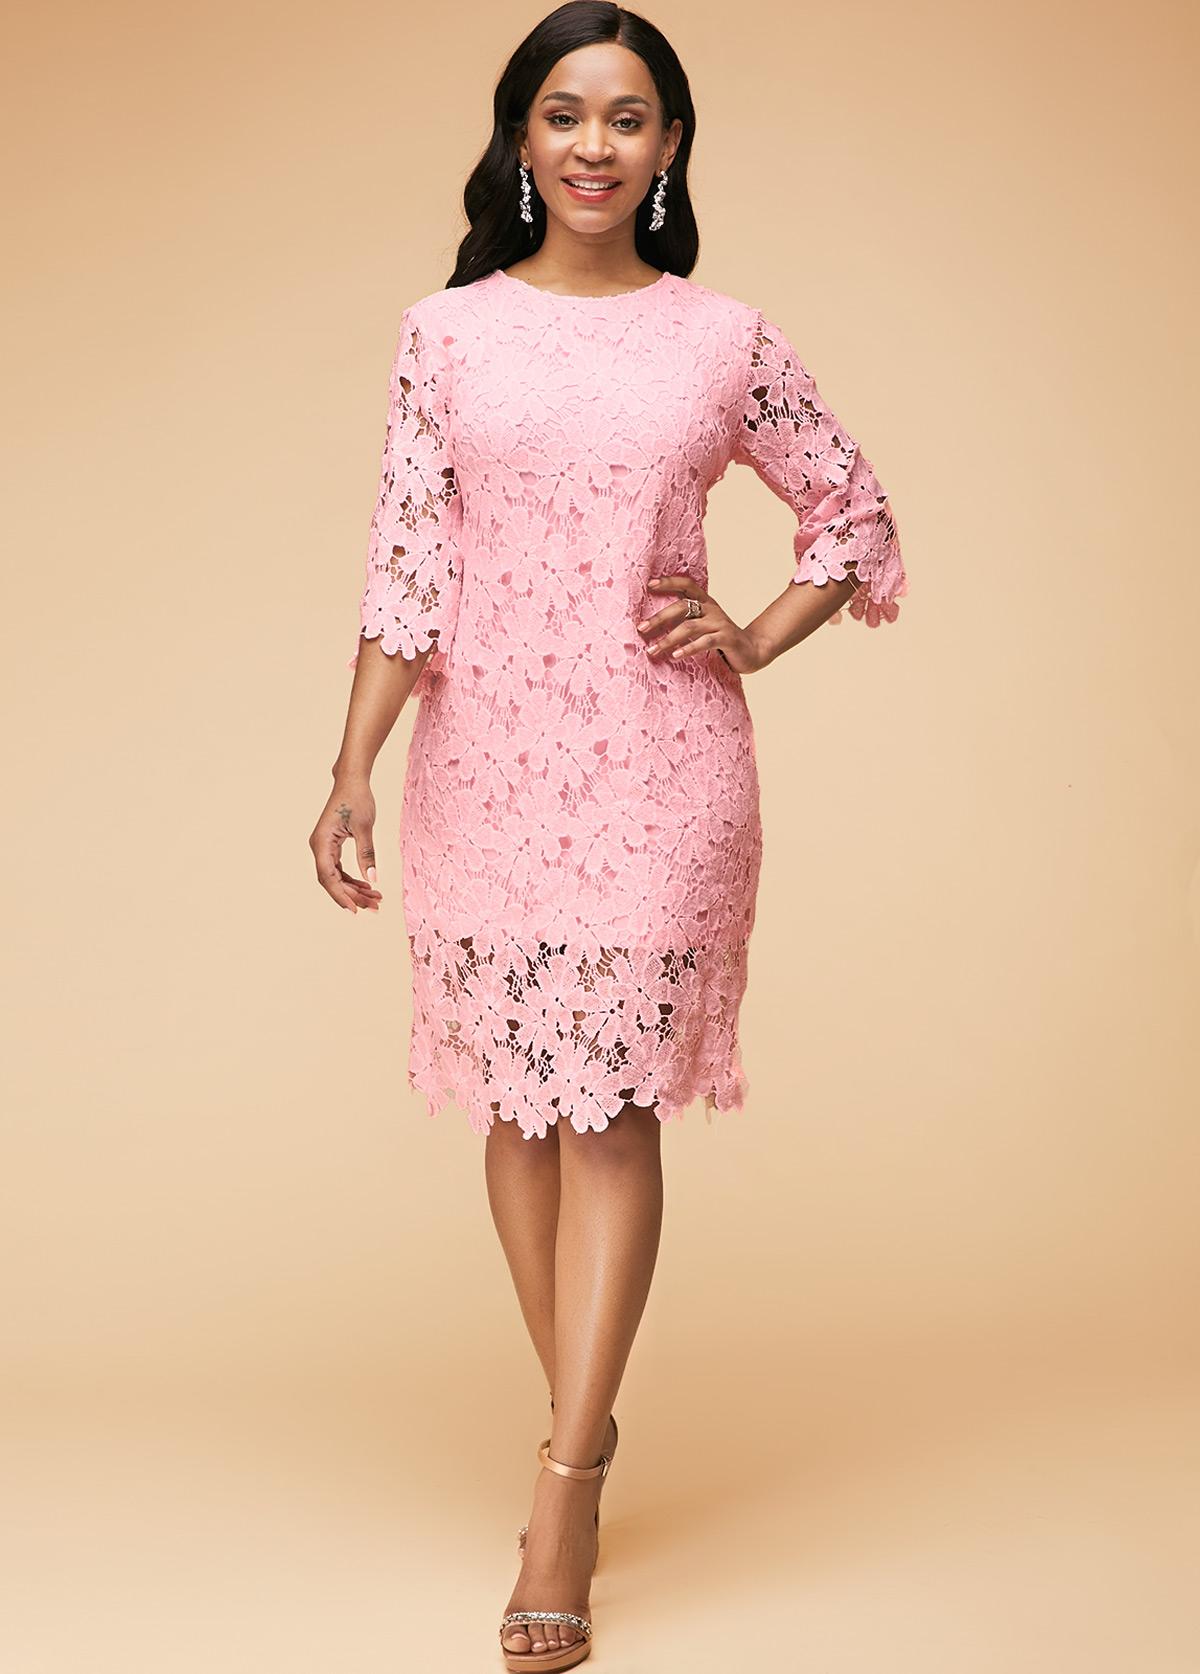 Lace Panel Round Neck Light Pink Dress